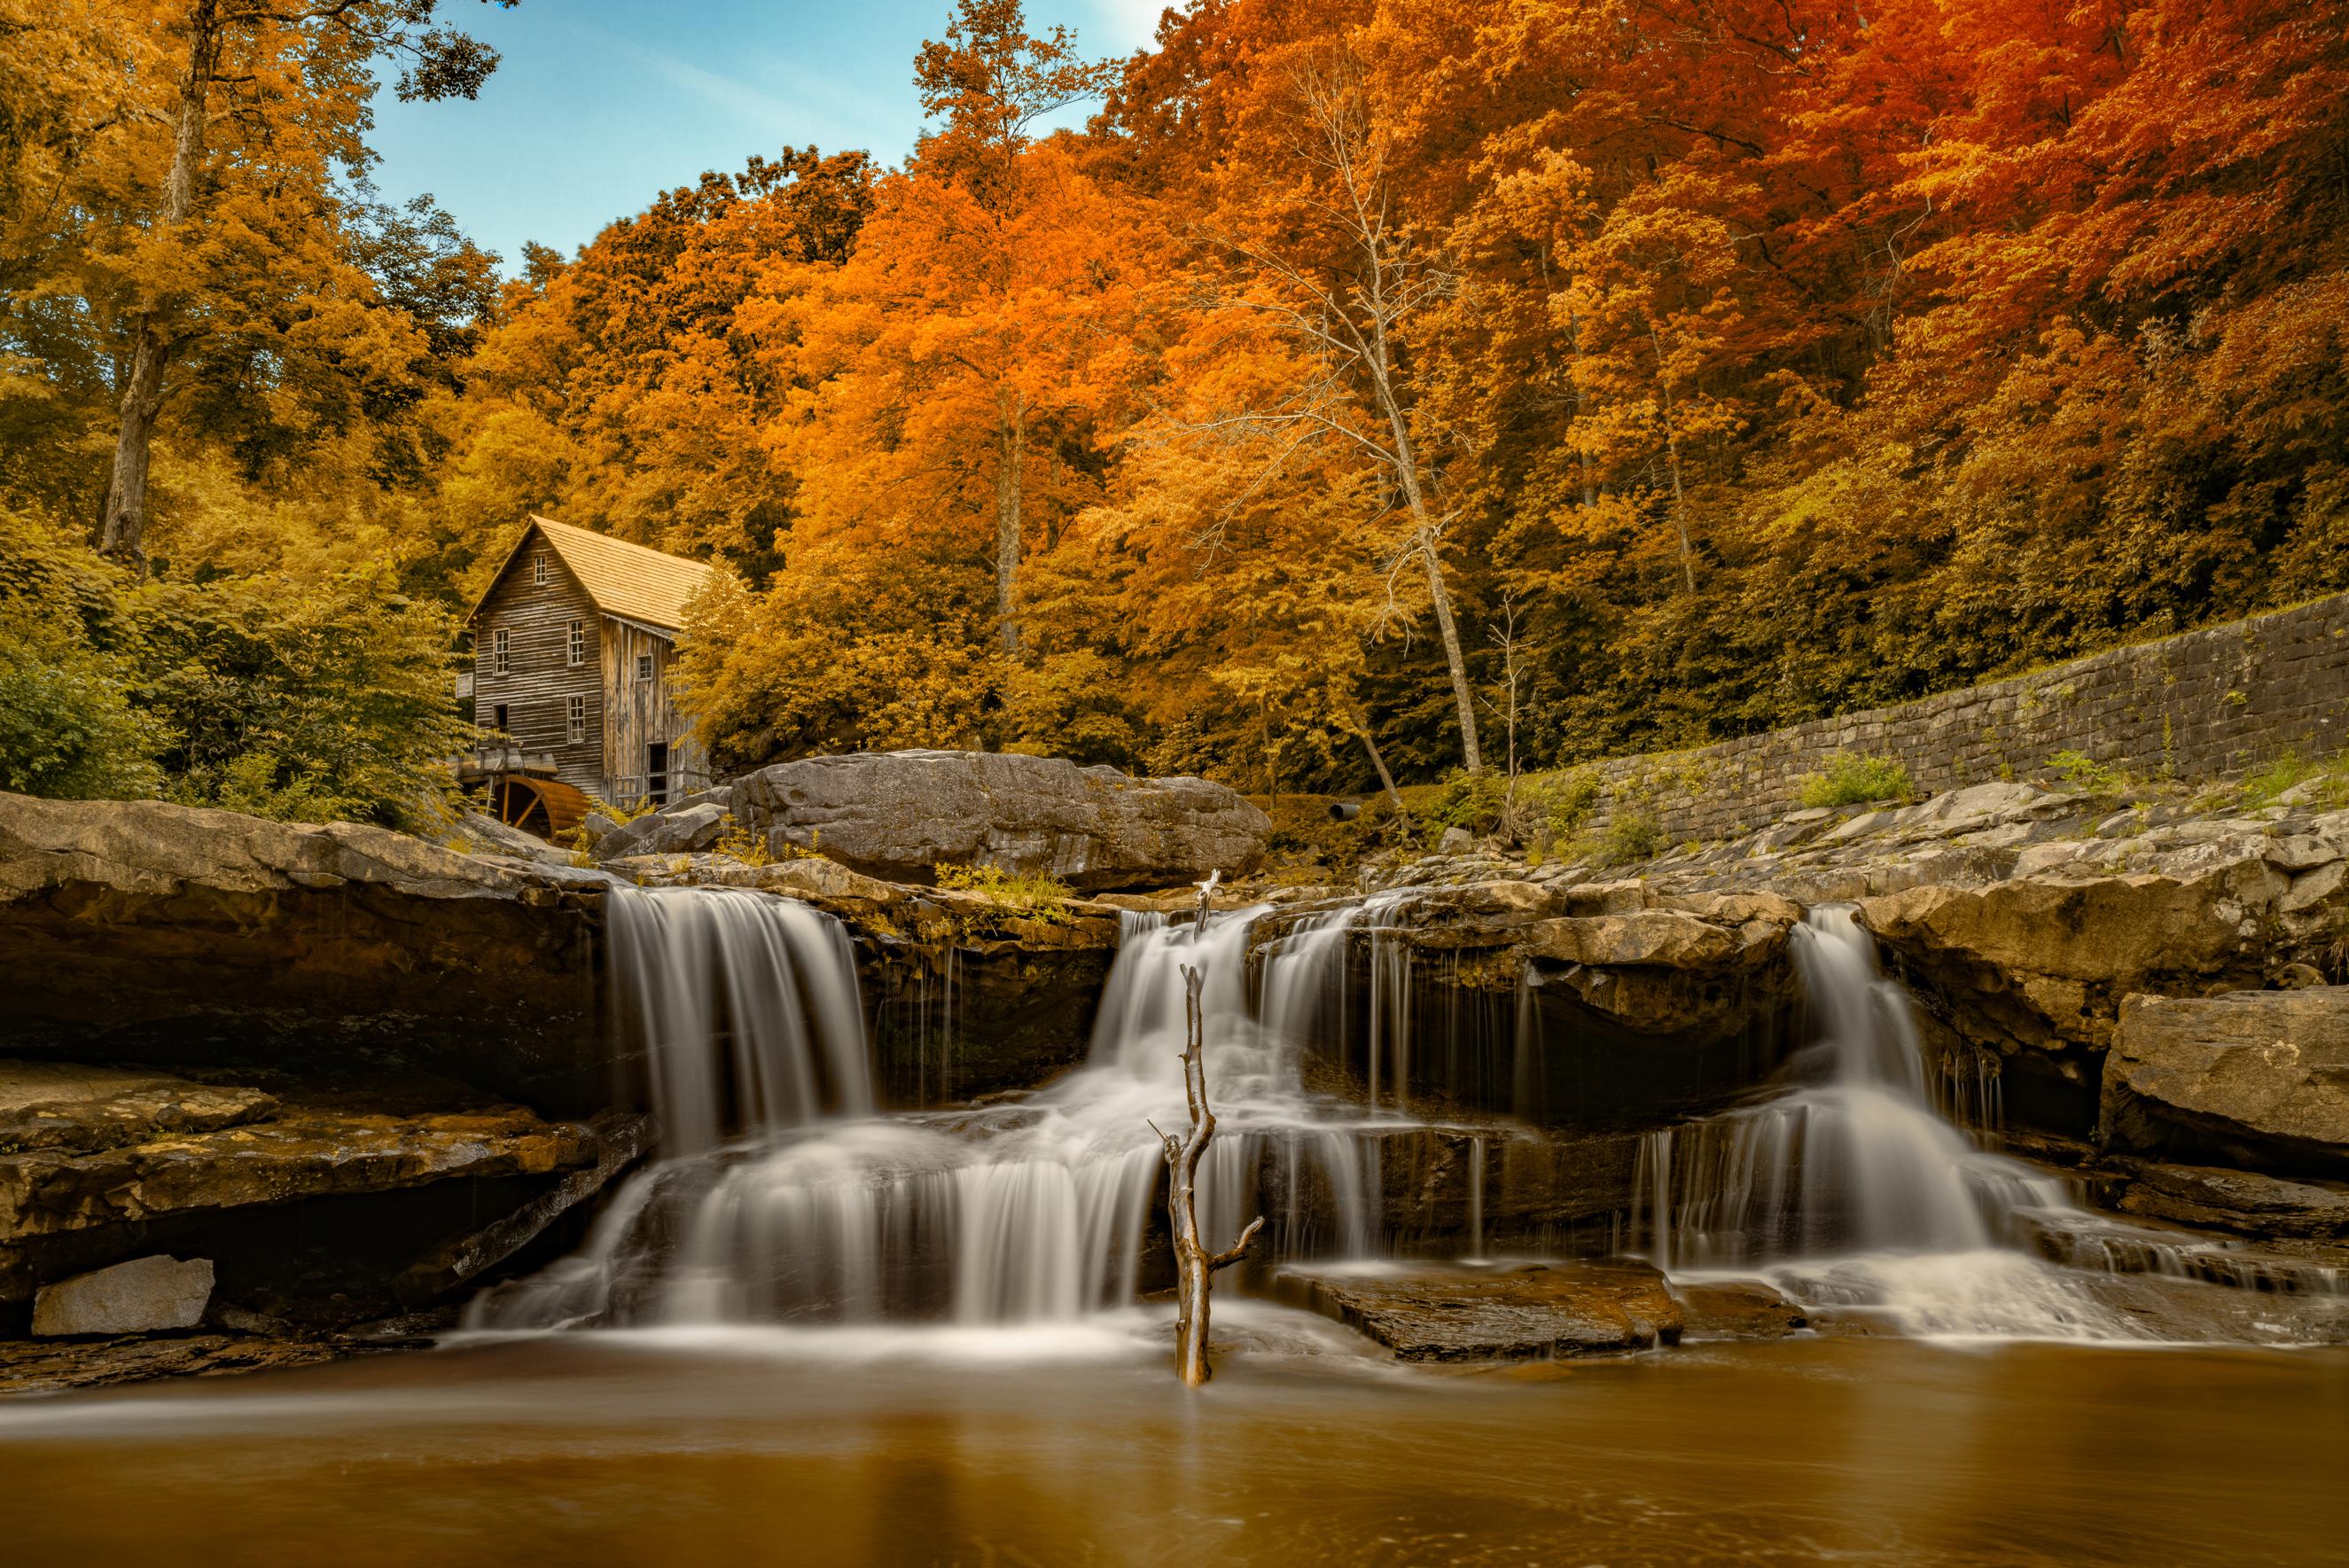 природа водопад деревья осень дом nature waterfall trees autumn the house скачать